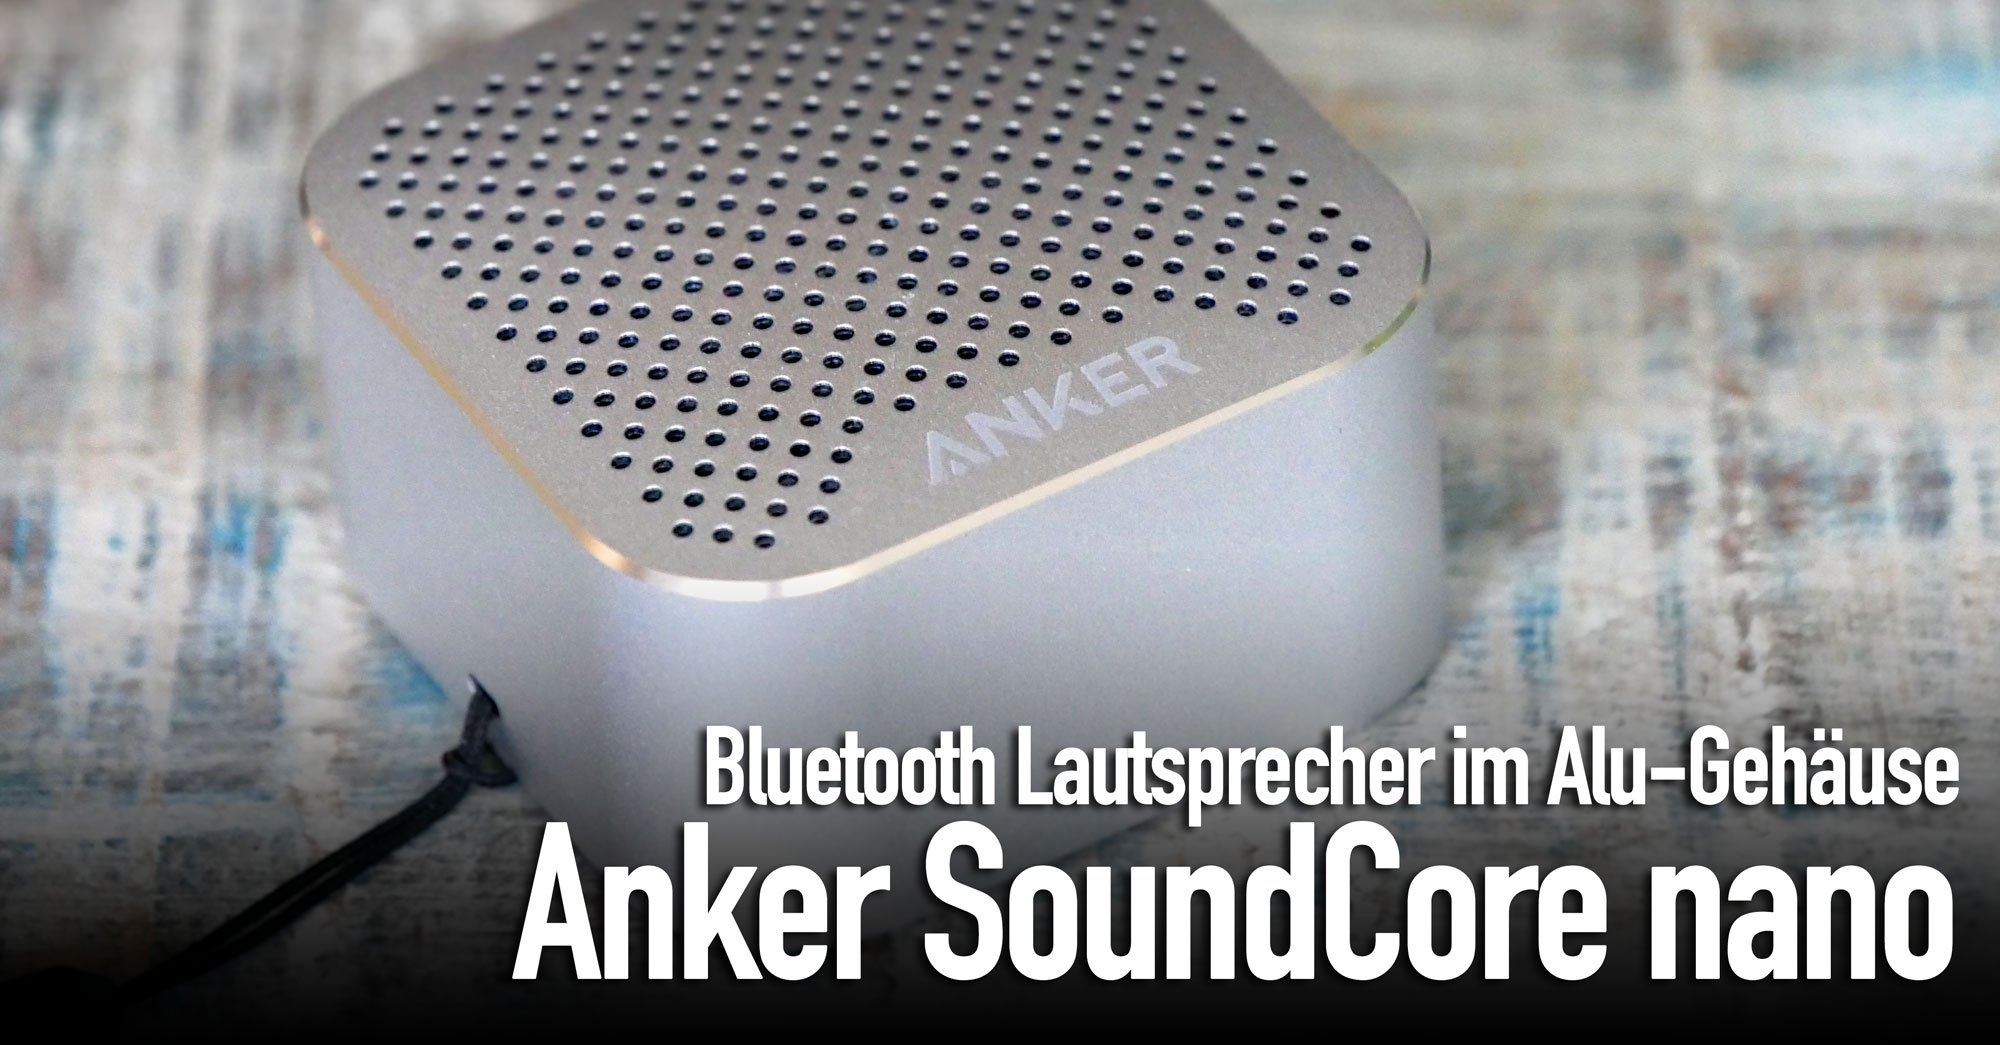 Anker SoundCore nano: kleiner, starker Aluminium Bluetooth Lautsprecher 4